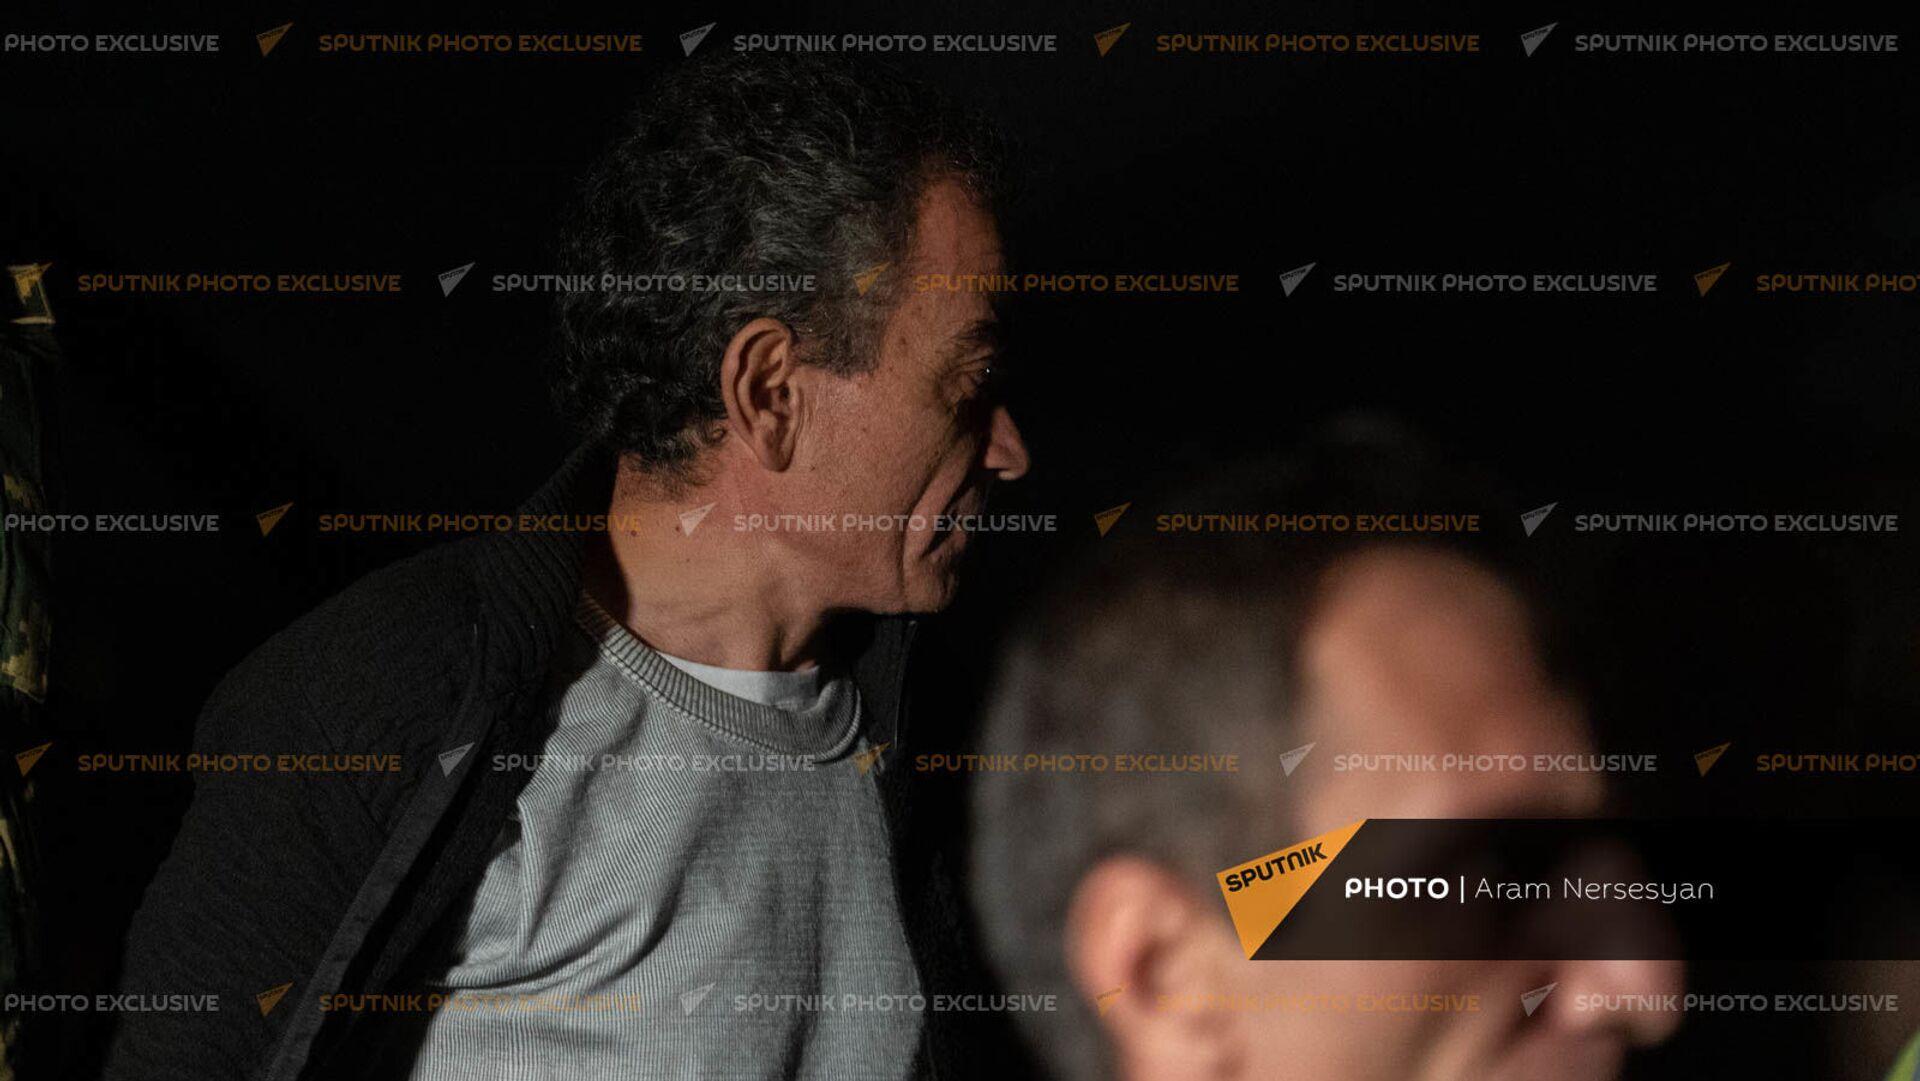 Вернувшиеся на родину военнопленные Артур Айкович Налбандян и Арамаис Грантович Торозян спускаются по трапу самолета в аэропорту Эребуни - Sputnik Արմենիա, 1920, 08.09.2021